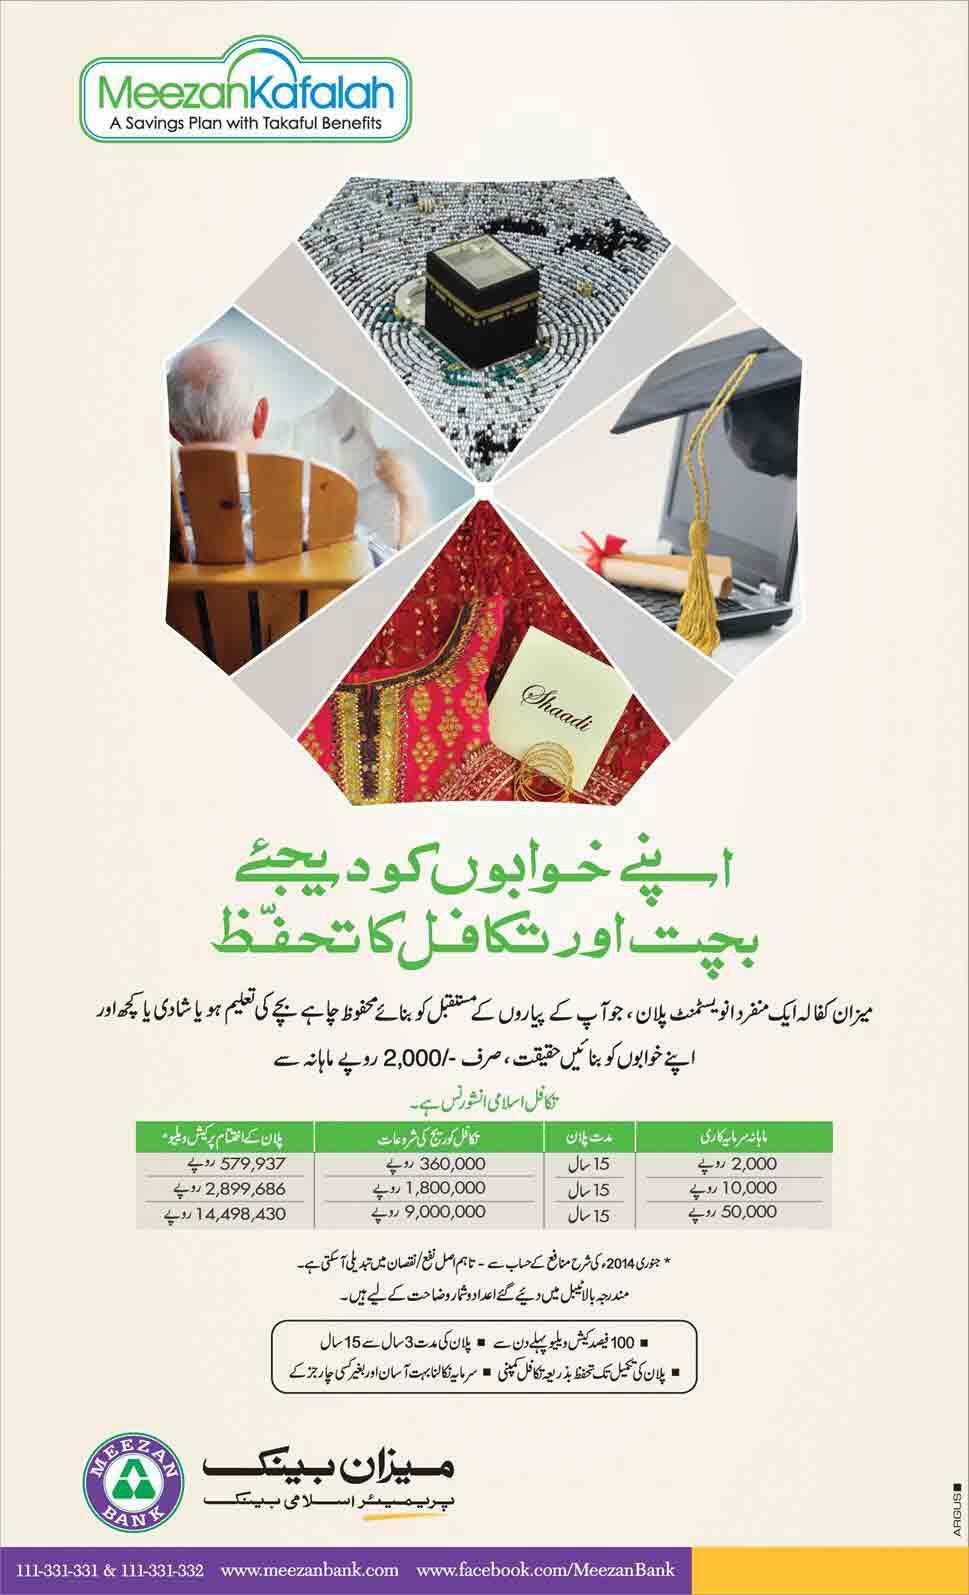 Meezan Bank saving Plan 2014 Meezan Bank awarded Best Islamic Bank in Pakistan